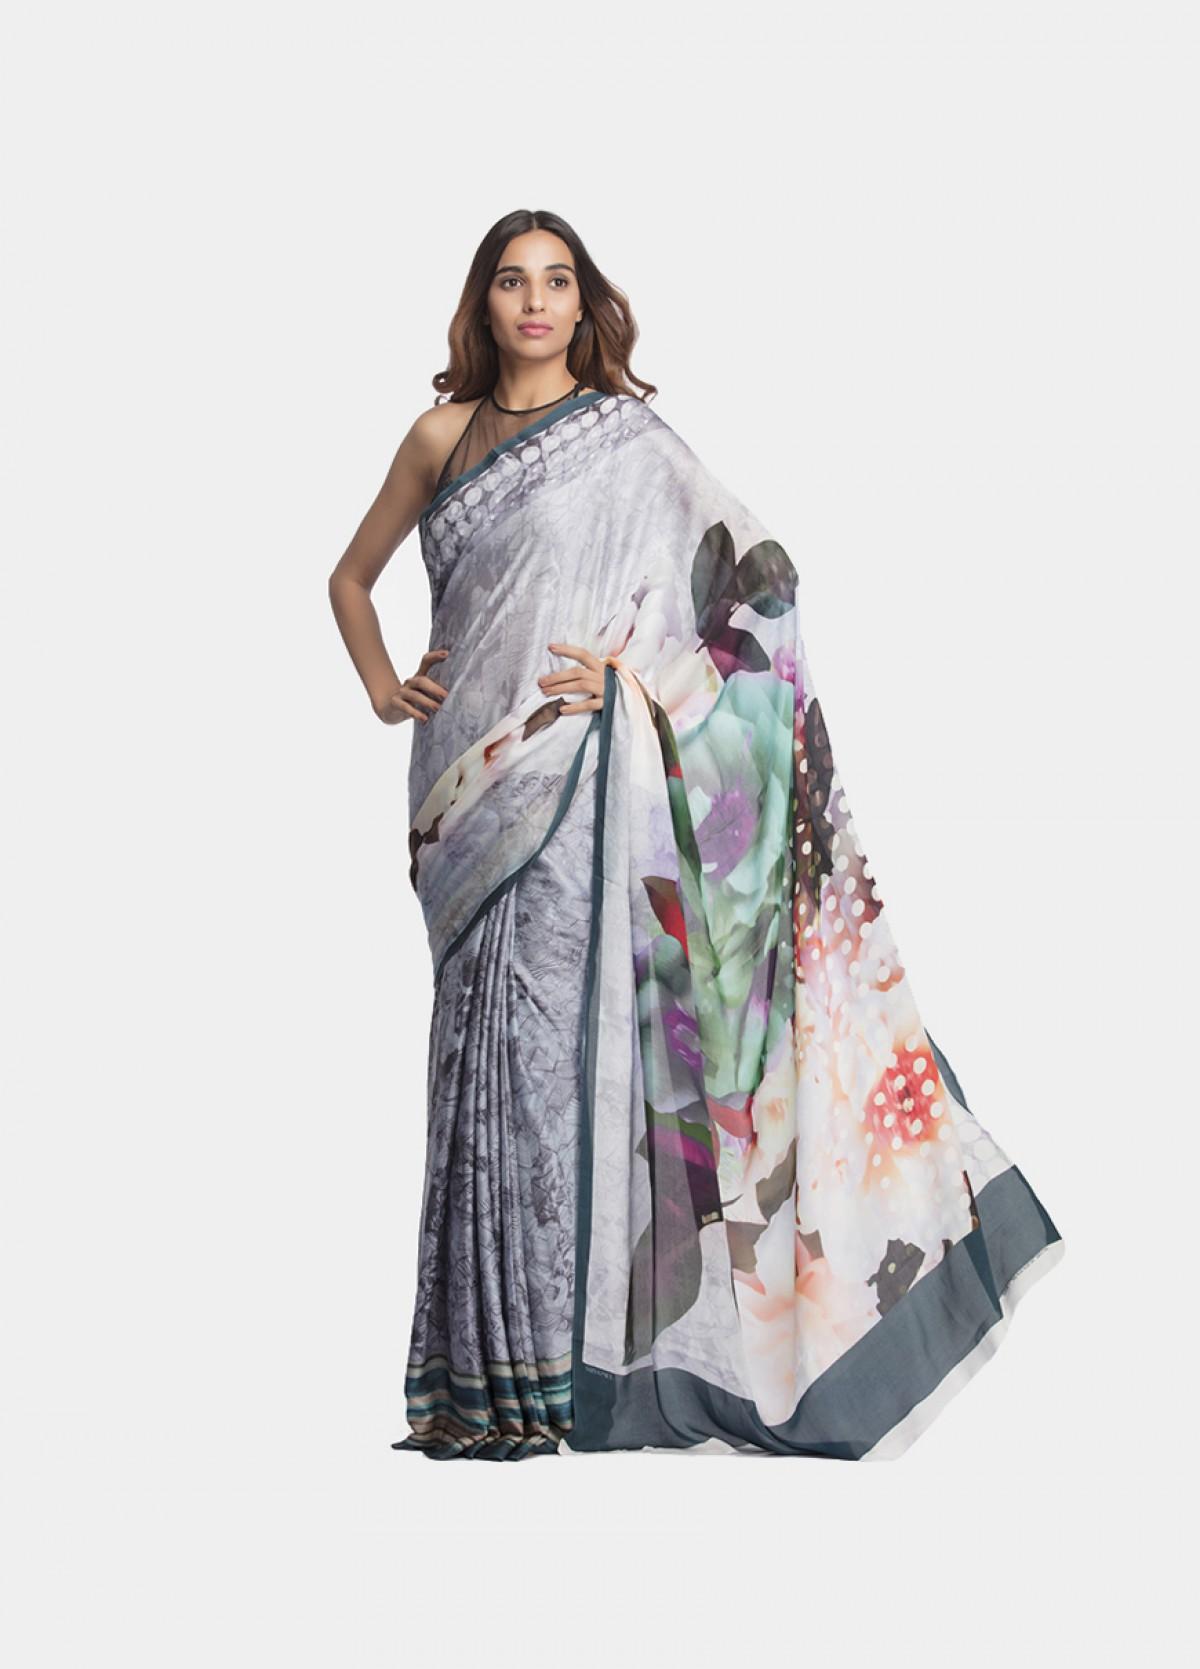 The Print Embellished Medium Grey Sari